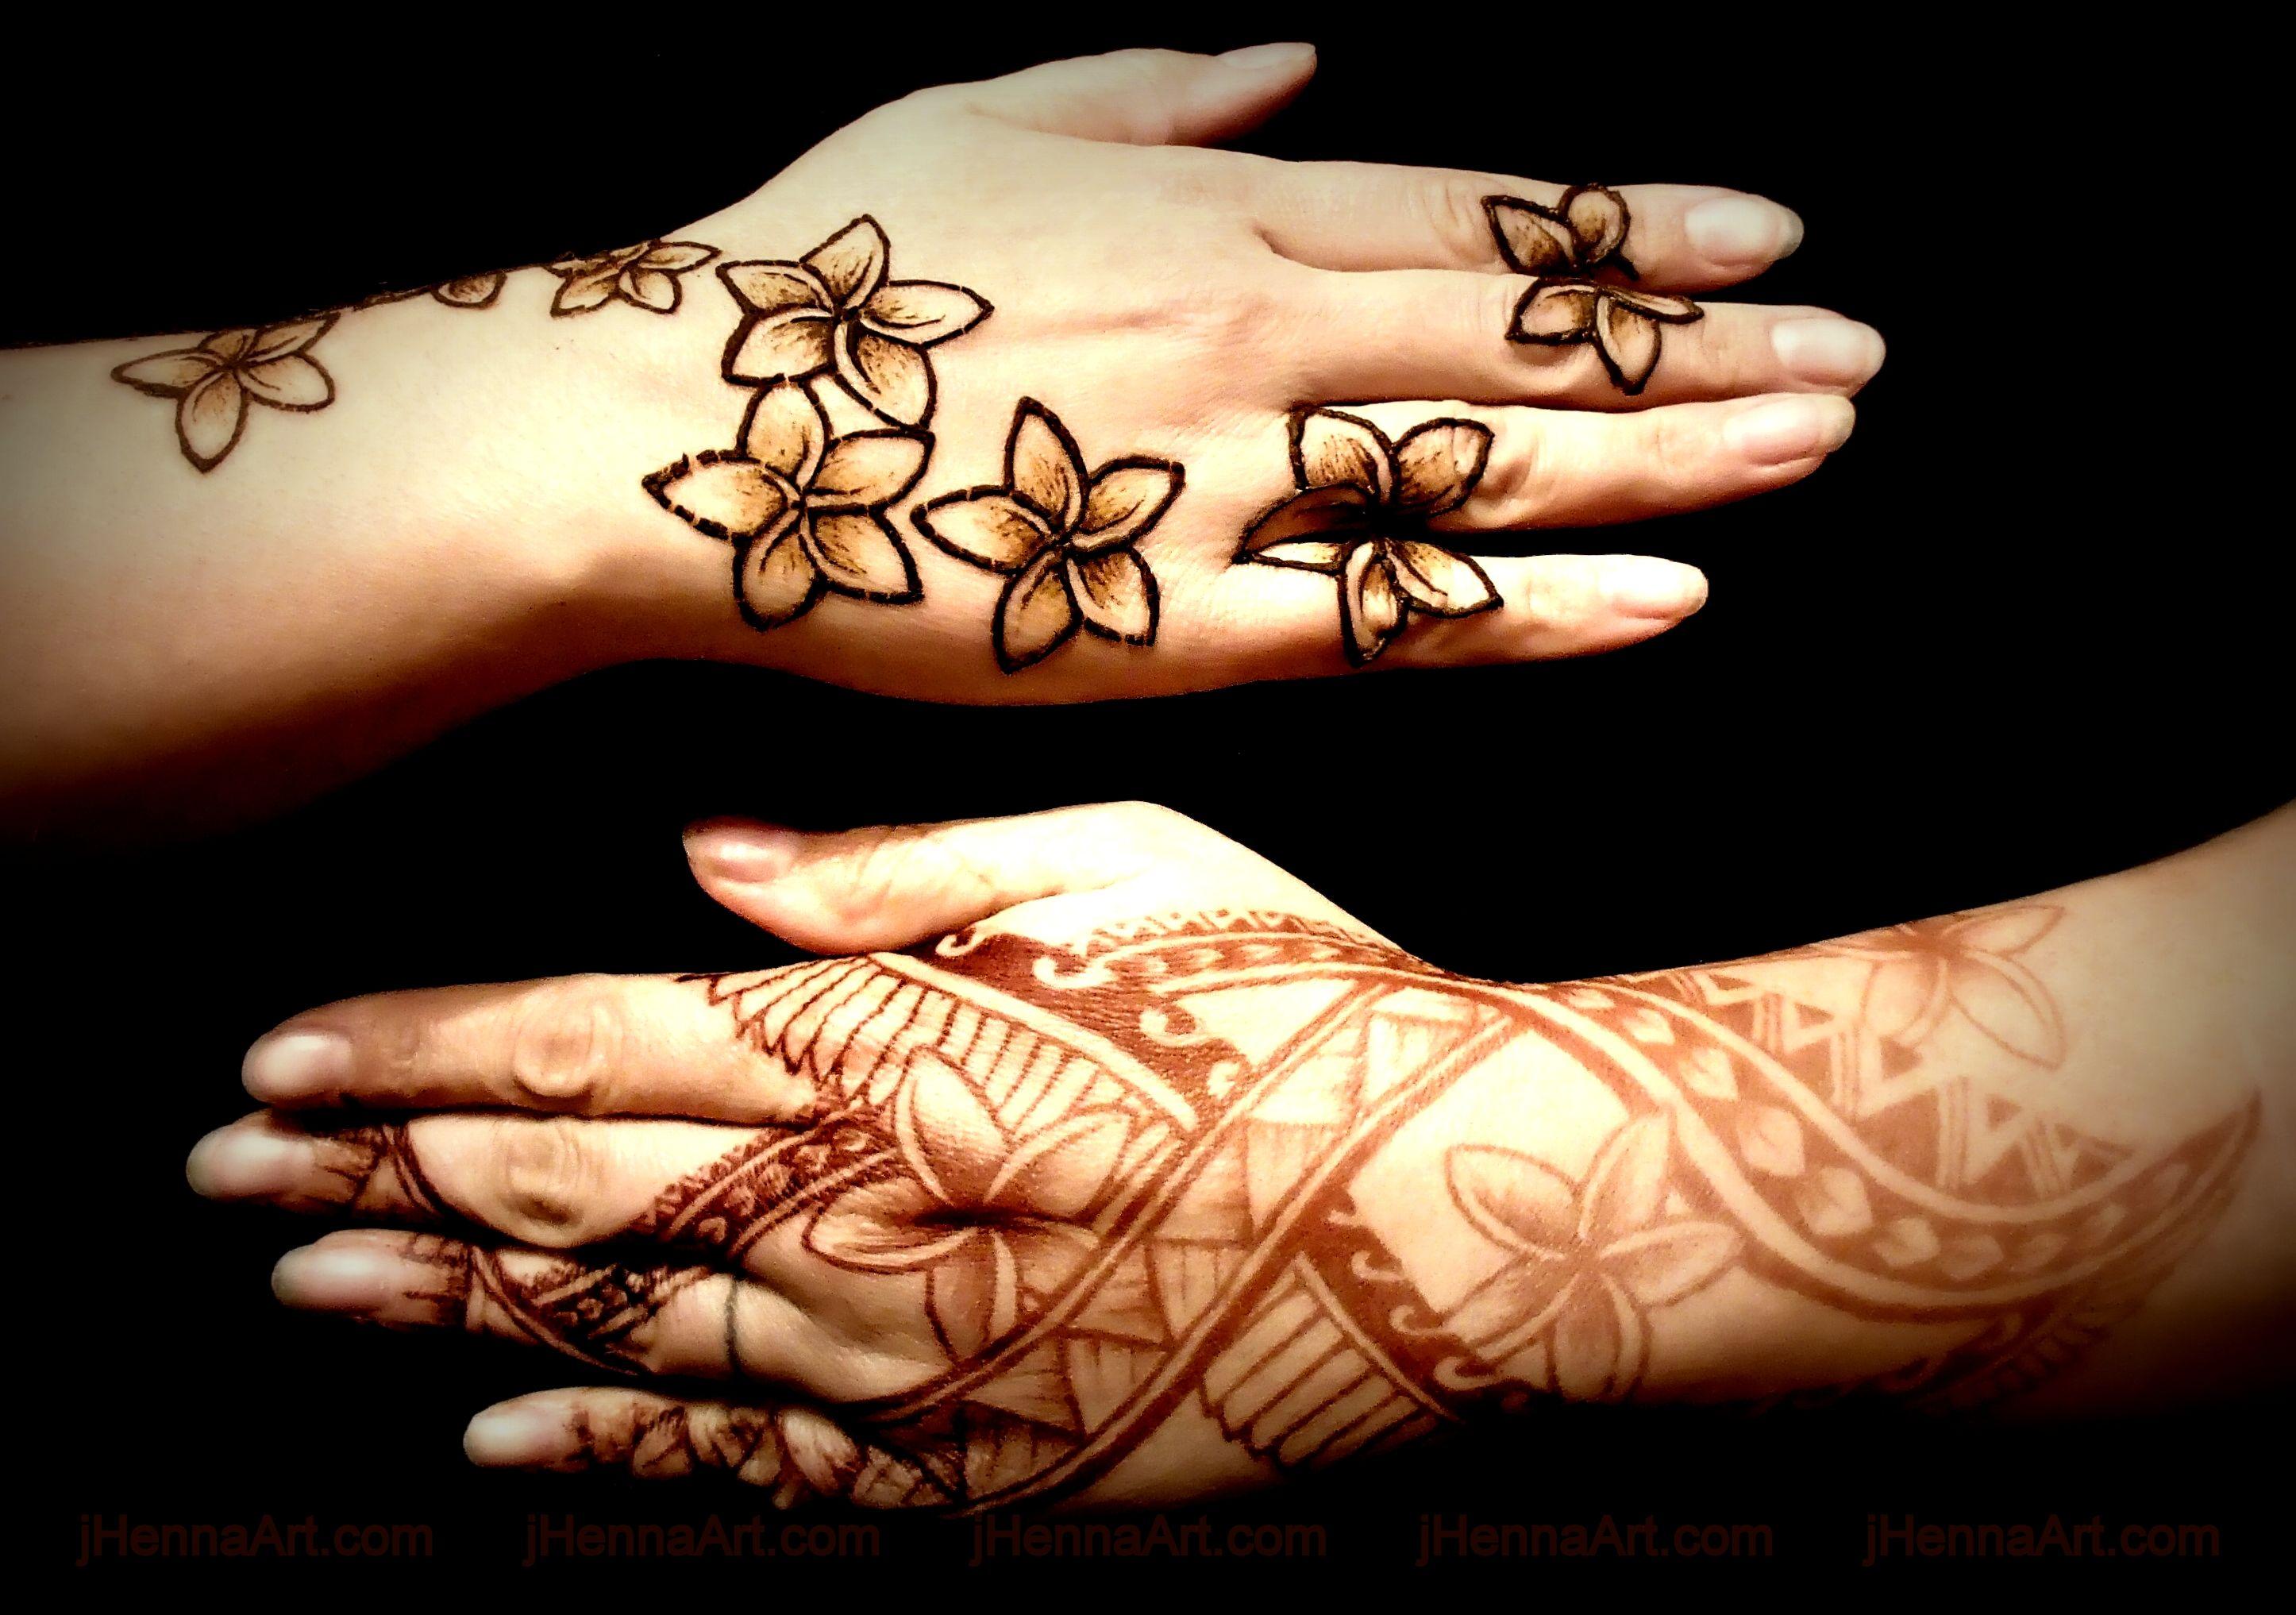 Polynesian Henna Tattoo: Polynesian Henna Designs By J.Henna (With Images)